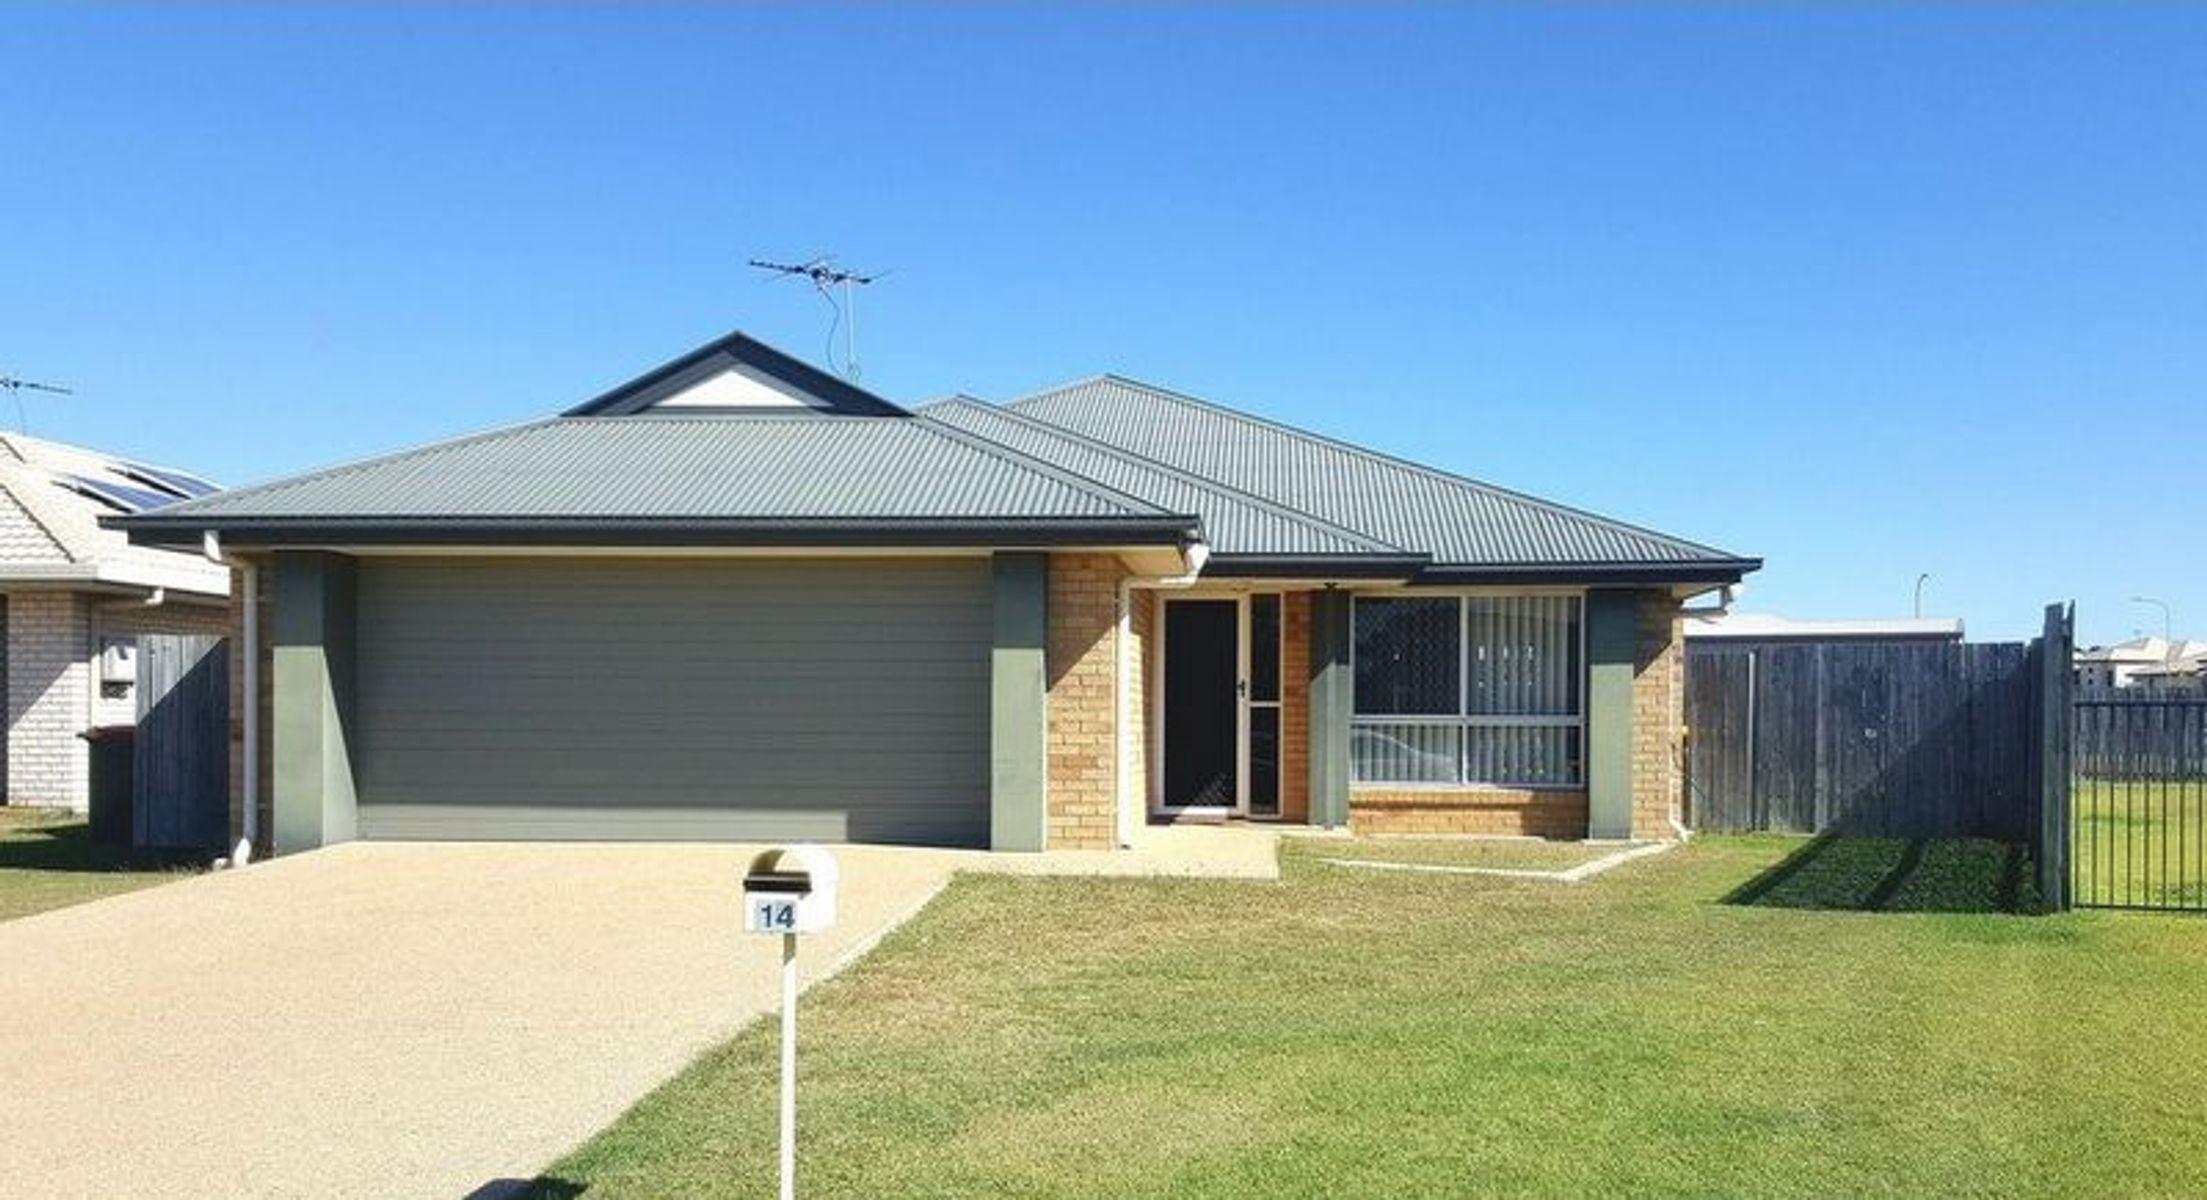 14 Tippett Crescent, Gracemere, QLD 4702